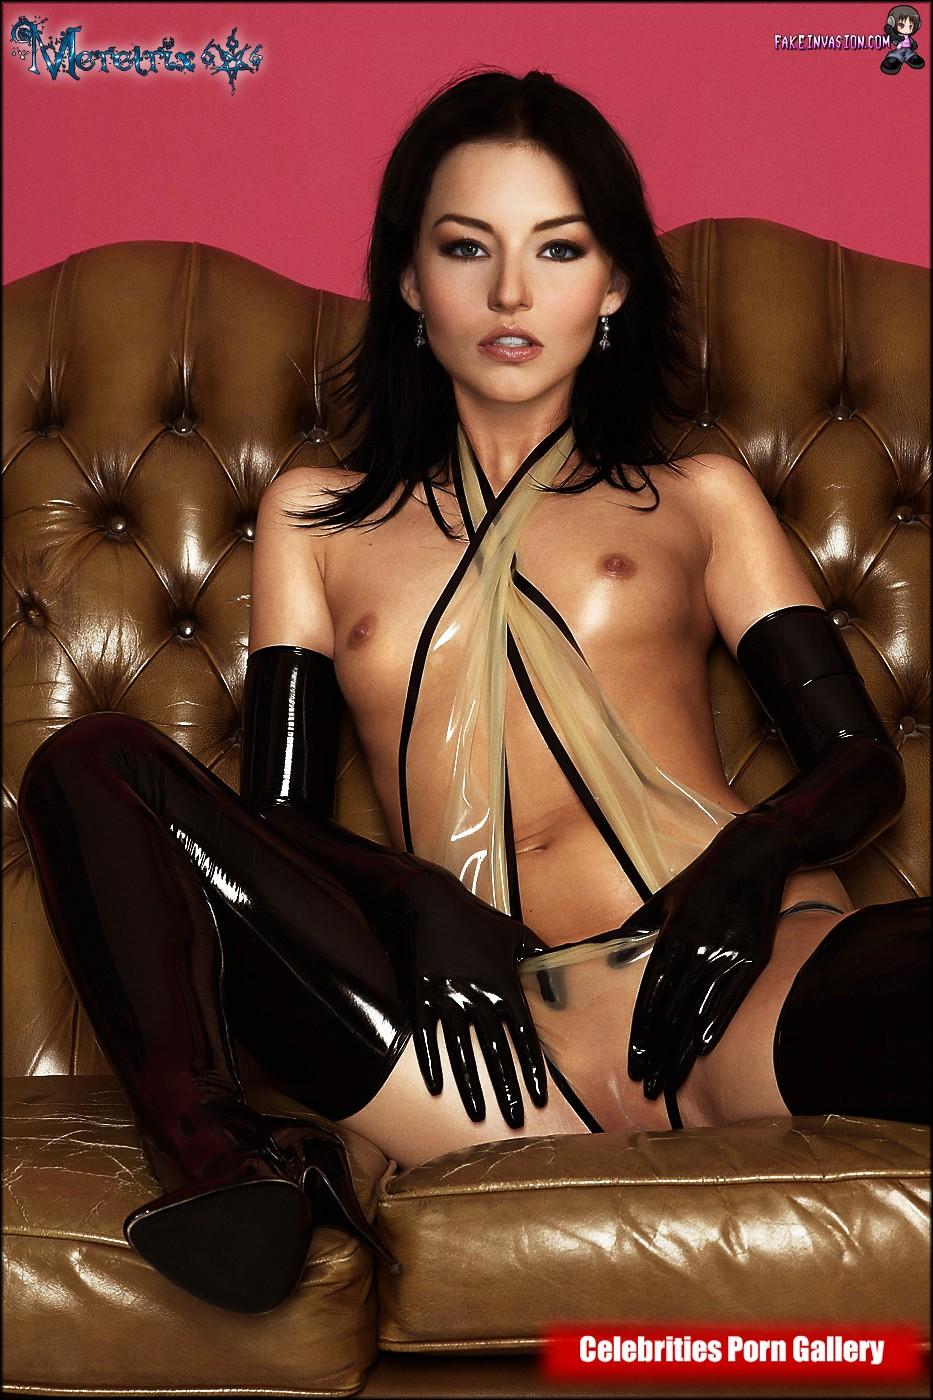 Angelique Boyer Fotos Porno angelique boyer free nude celebs » angelique-boyer-naked